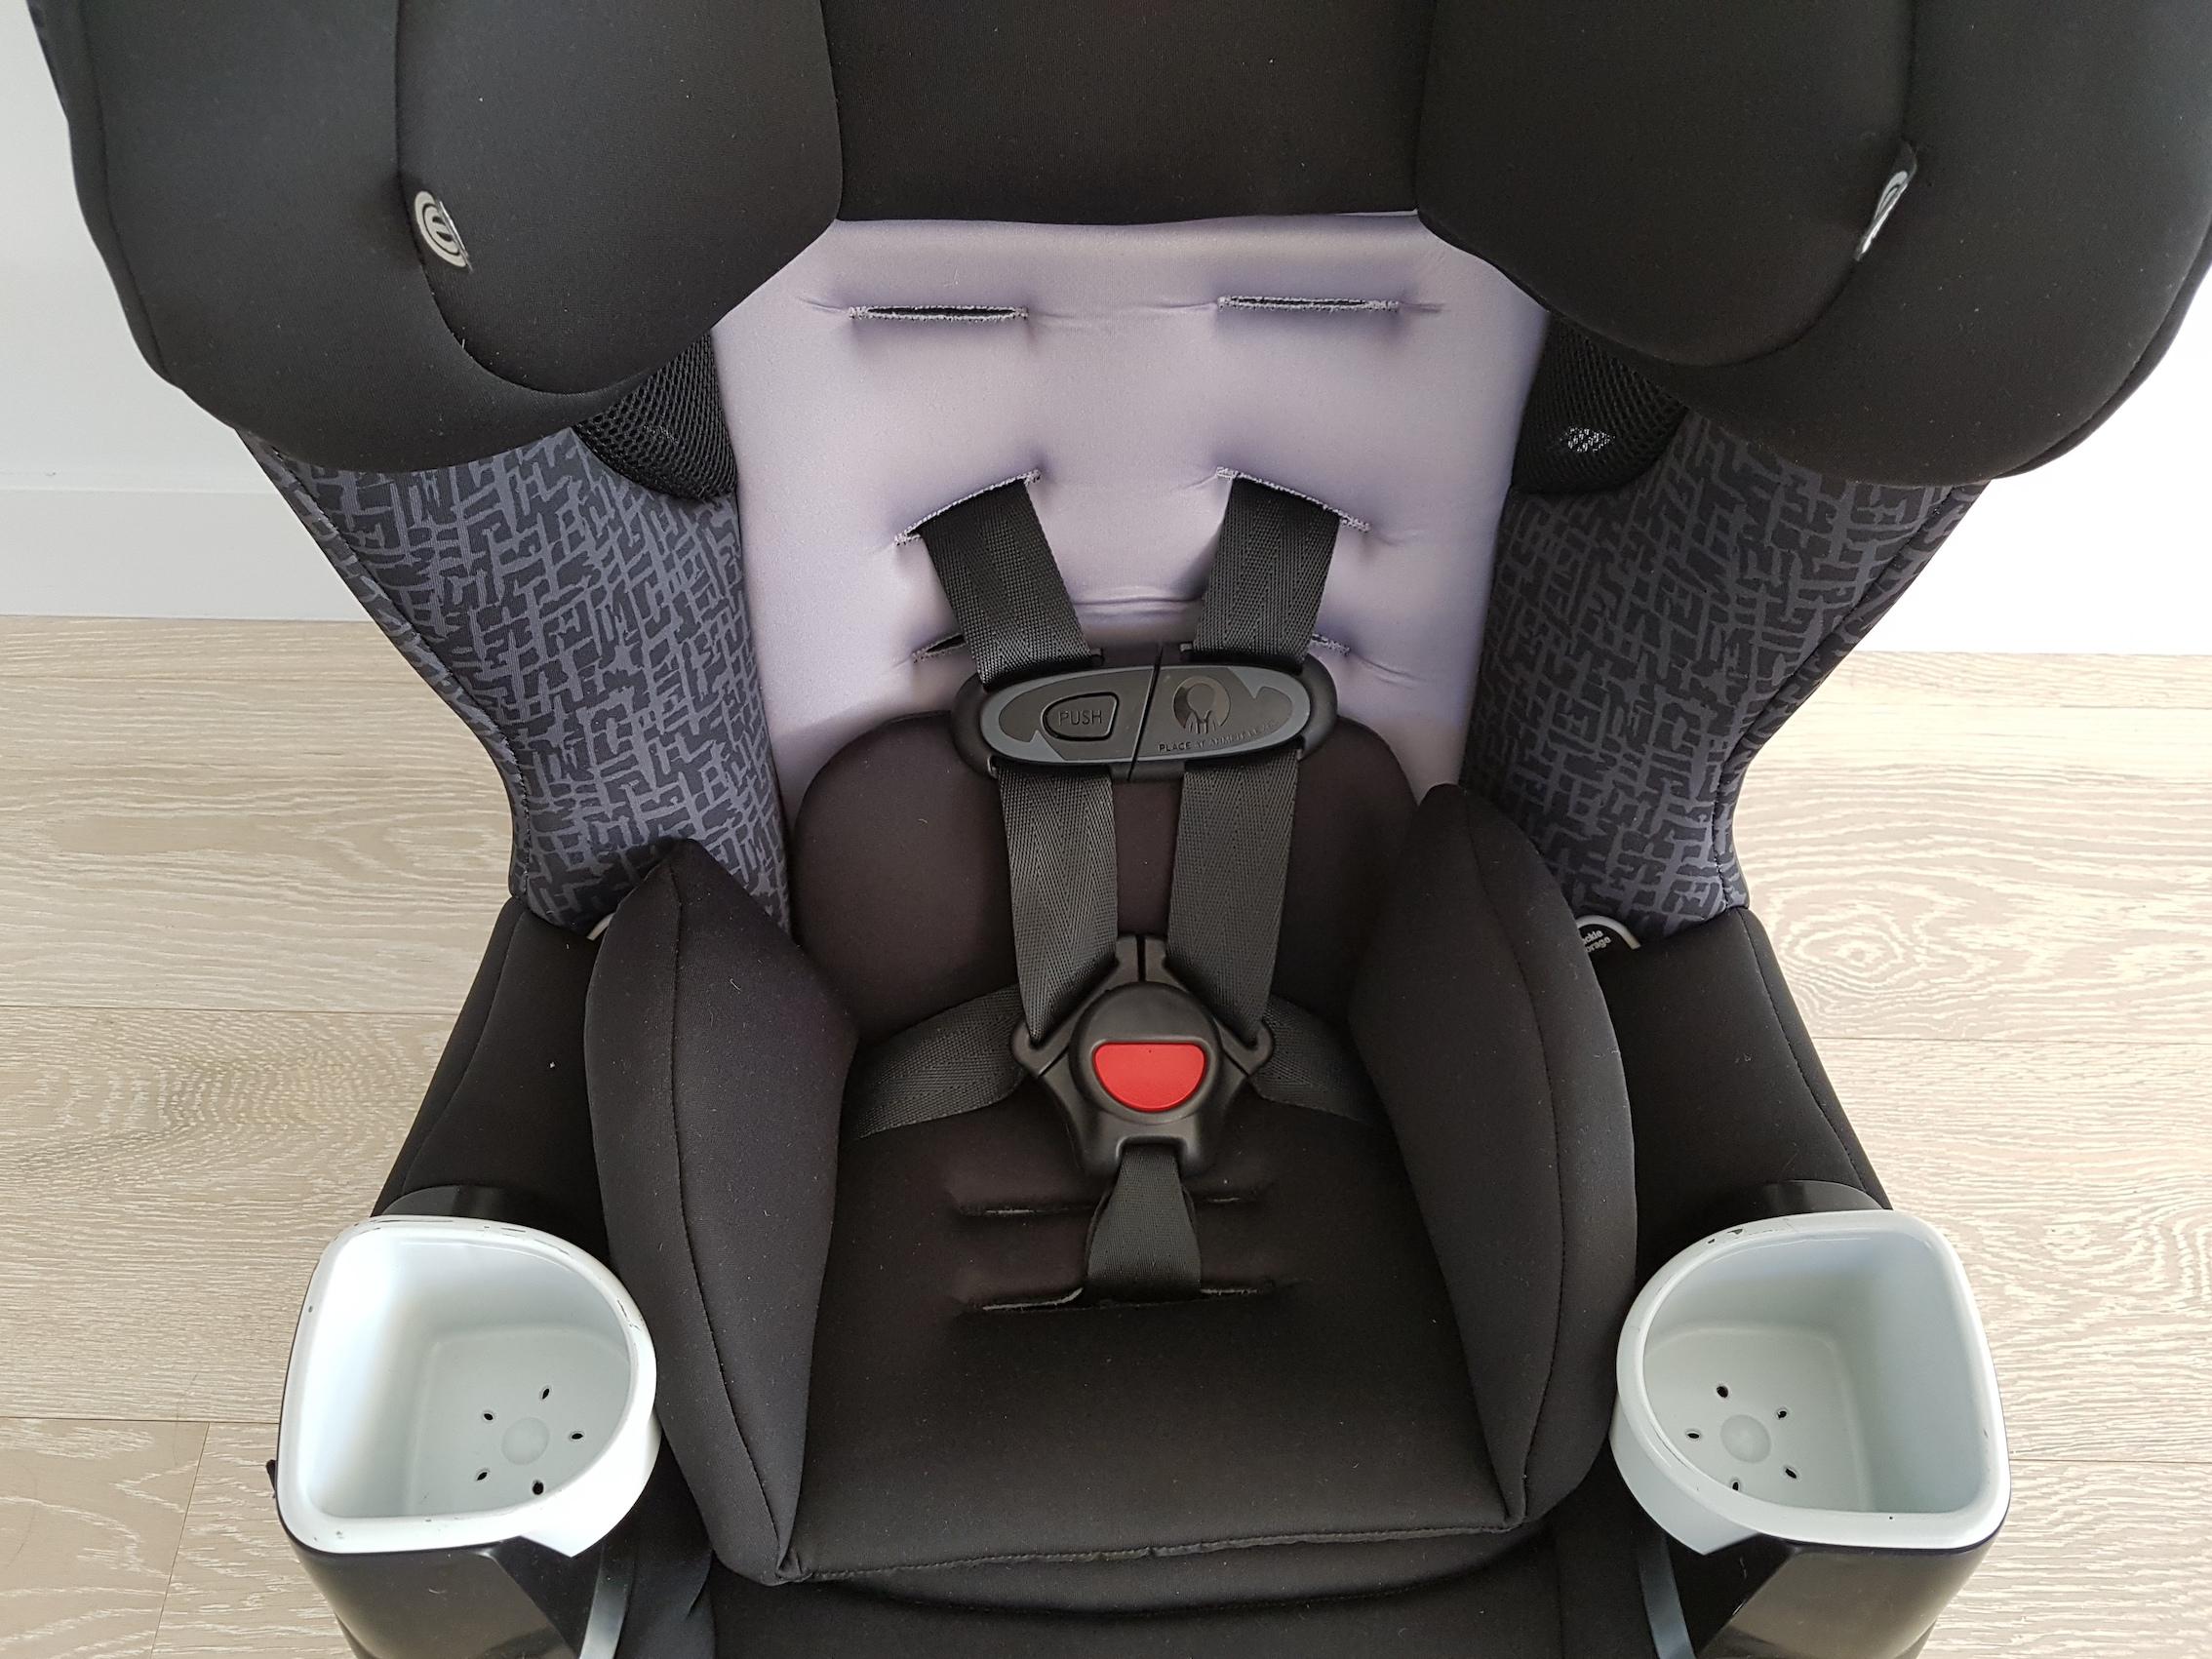 evenflo_car_seat_bby_harness